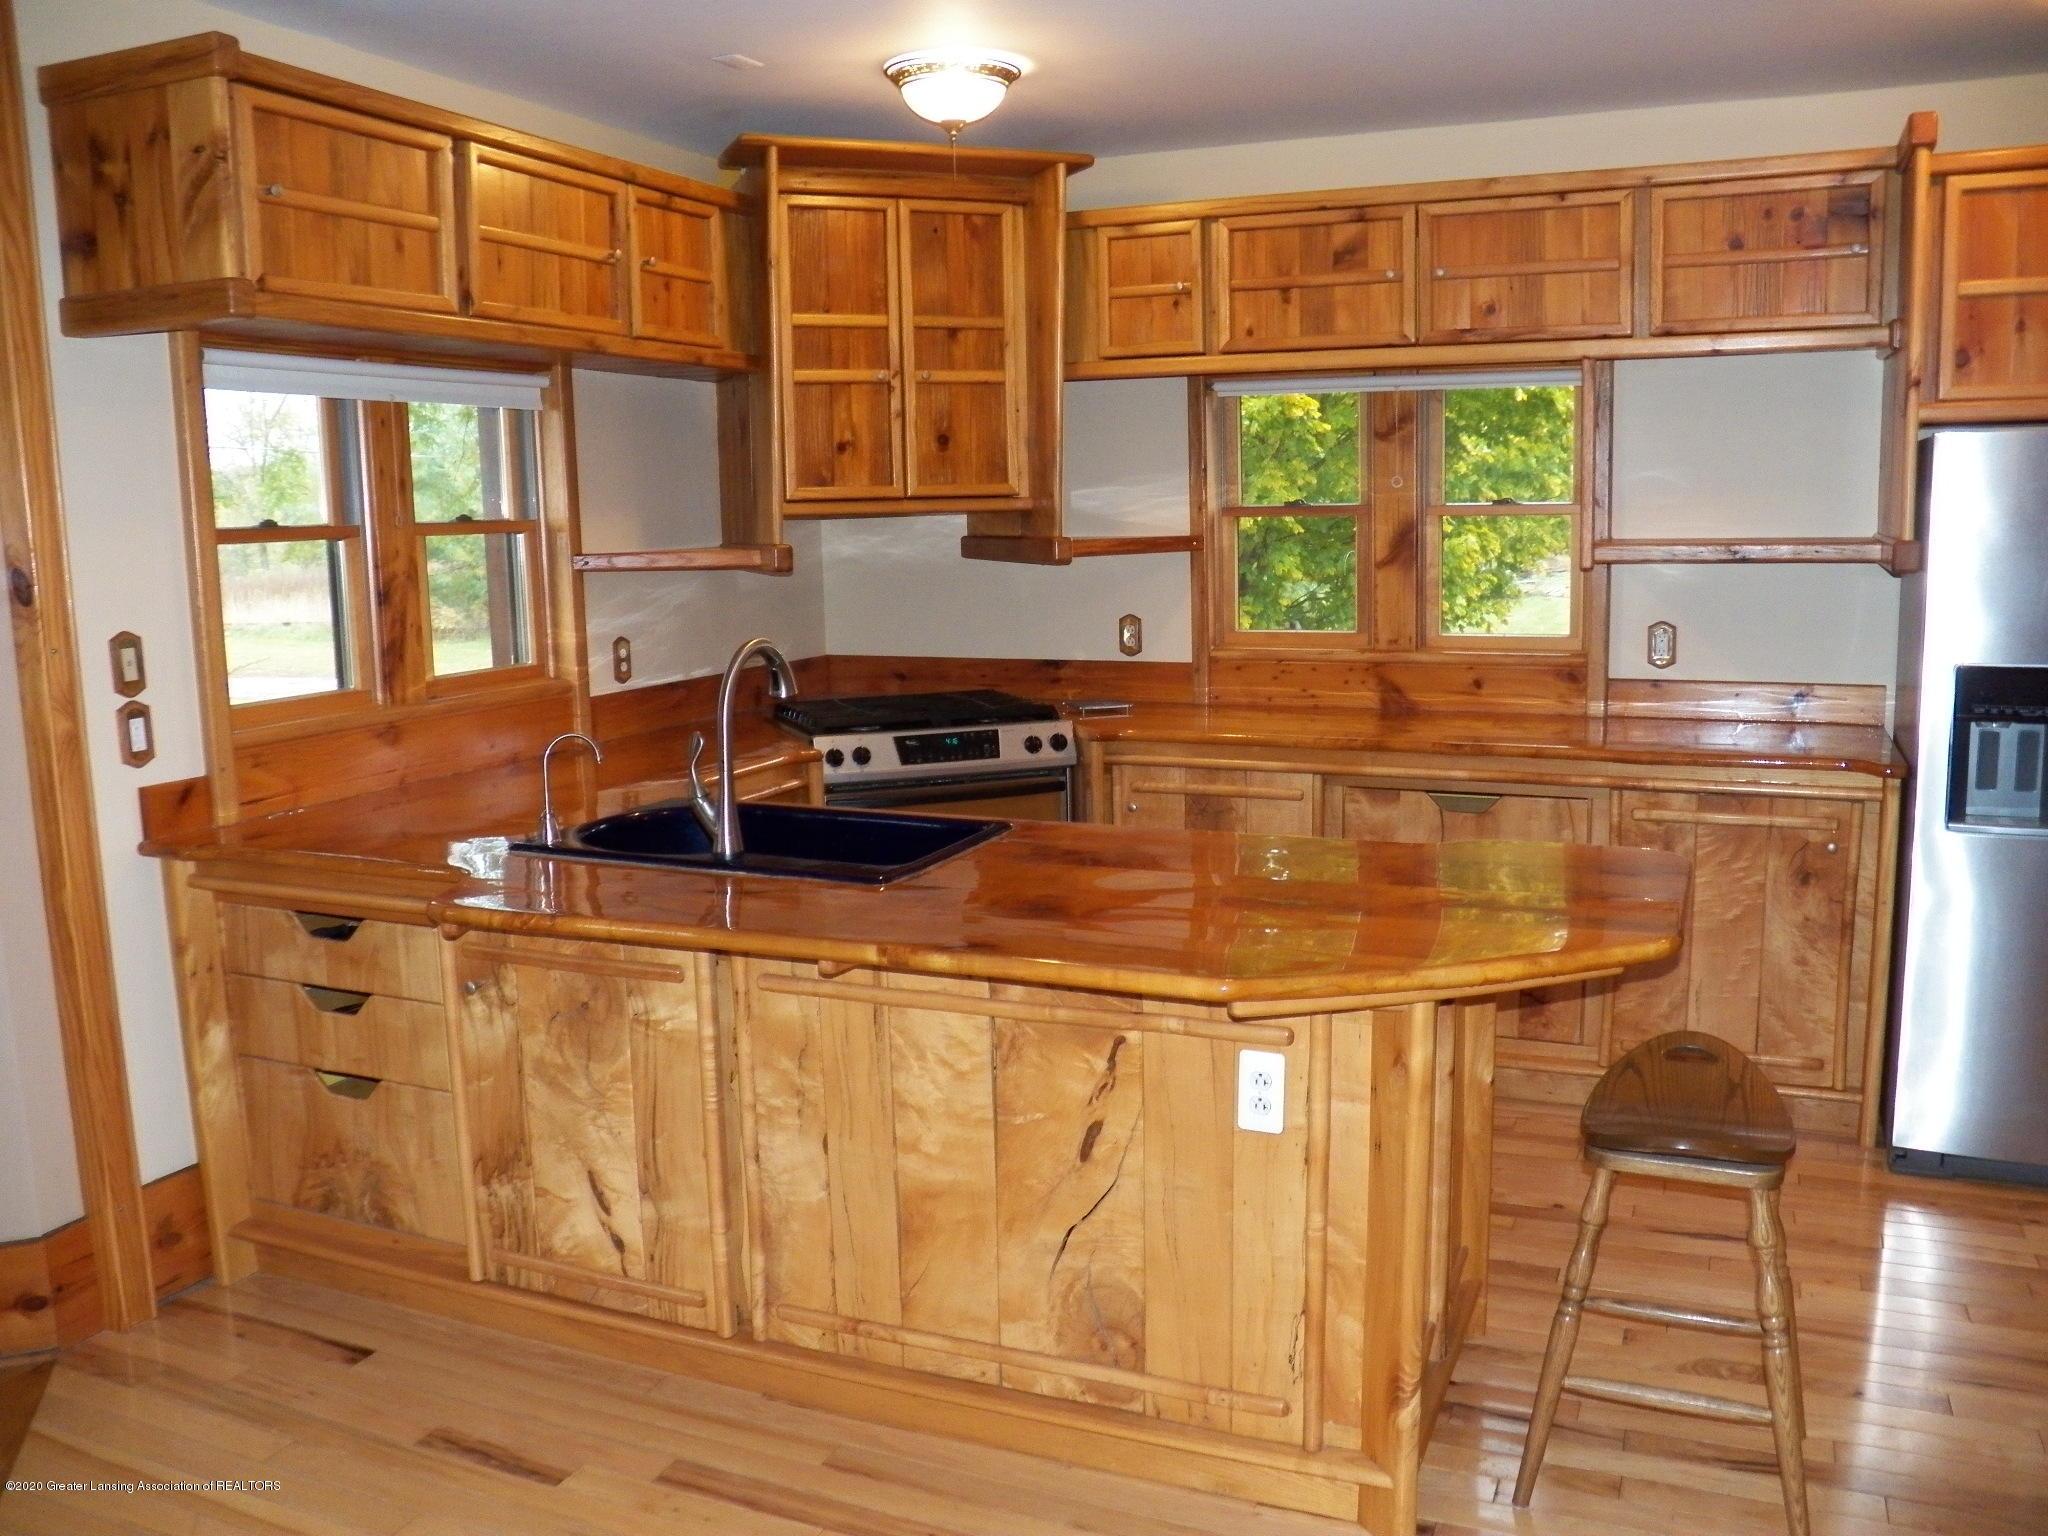 1584 W Barnes Rd - kitchen 2 - 7